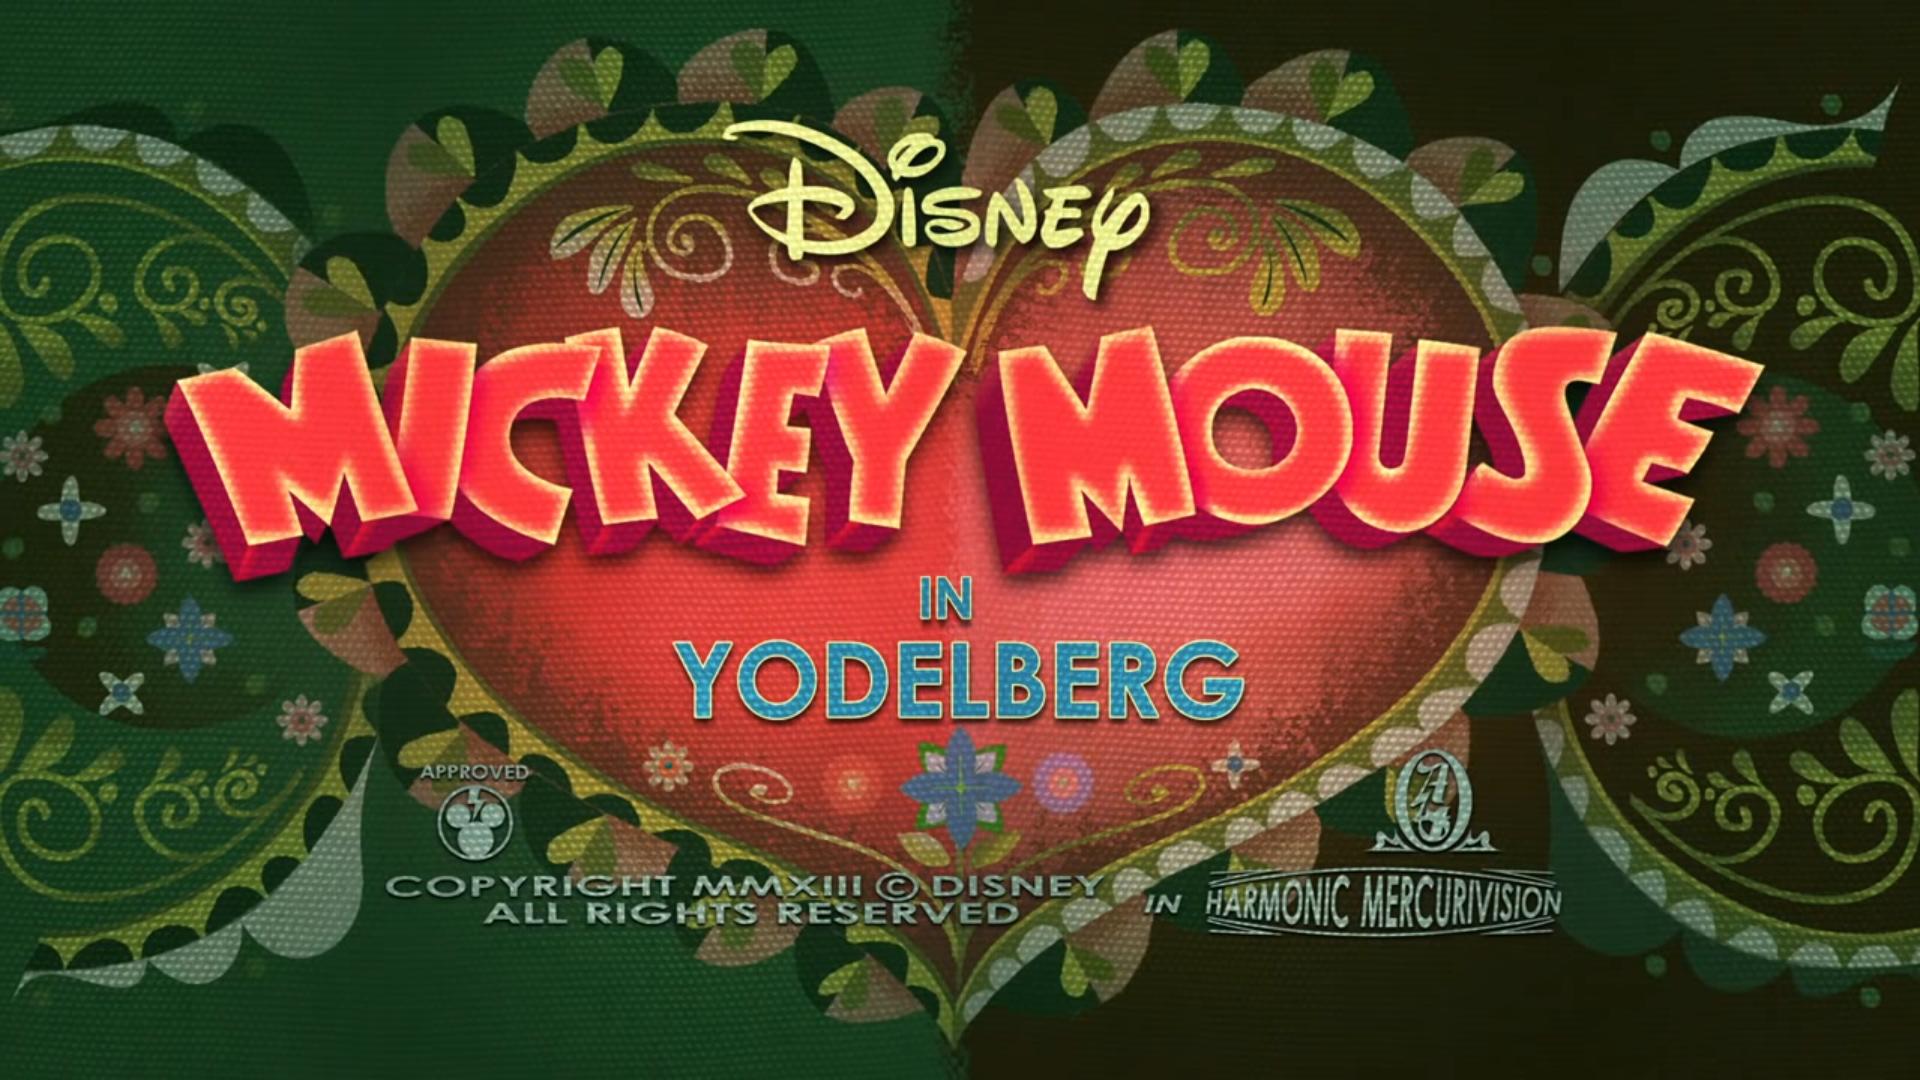 Yodelberg